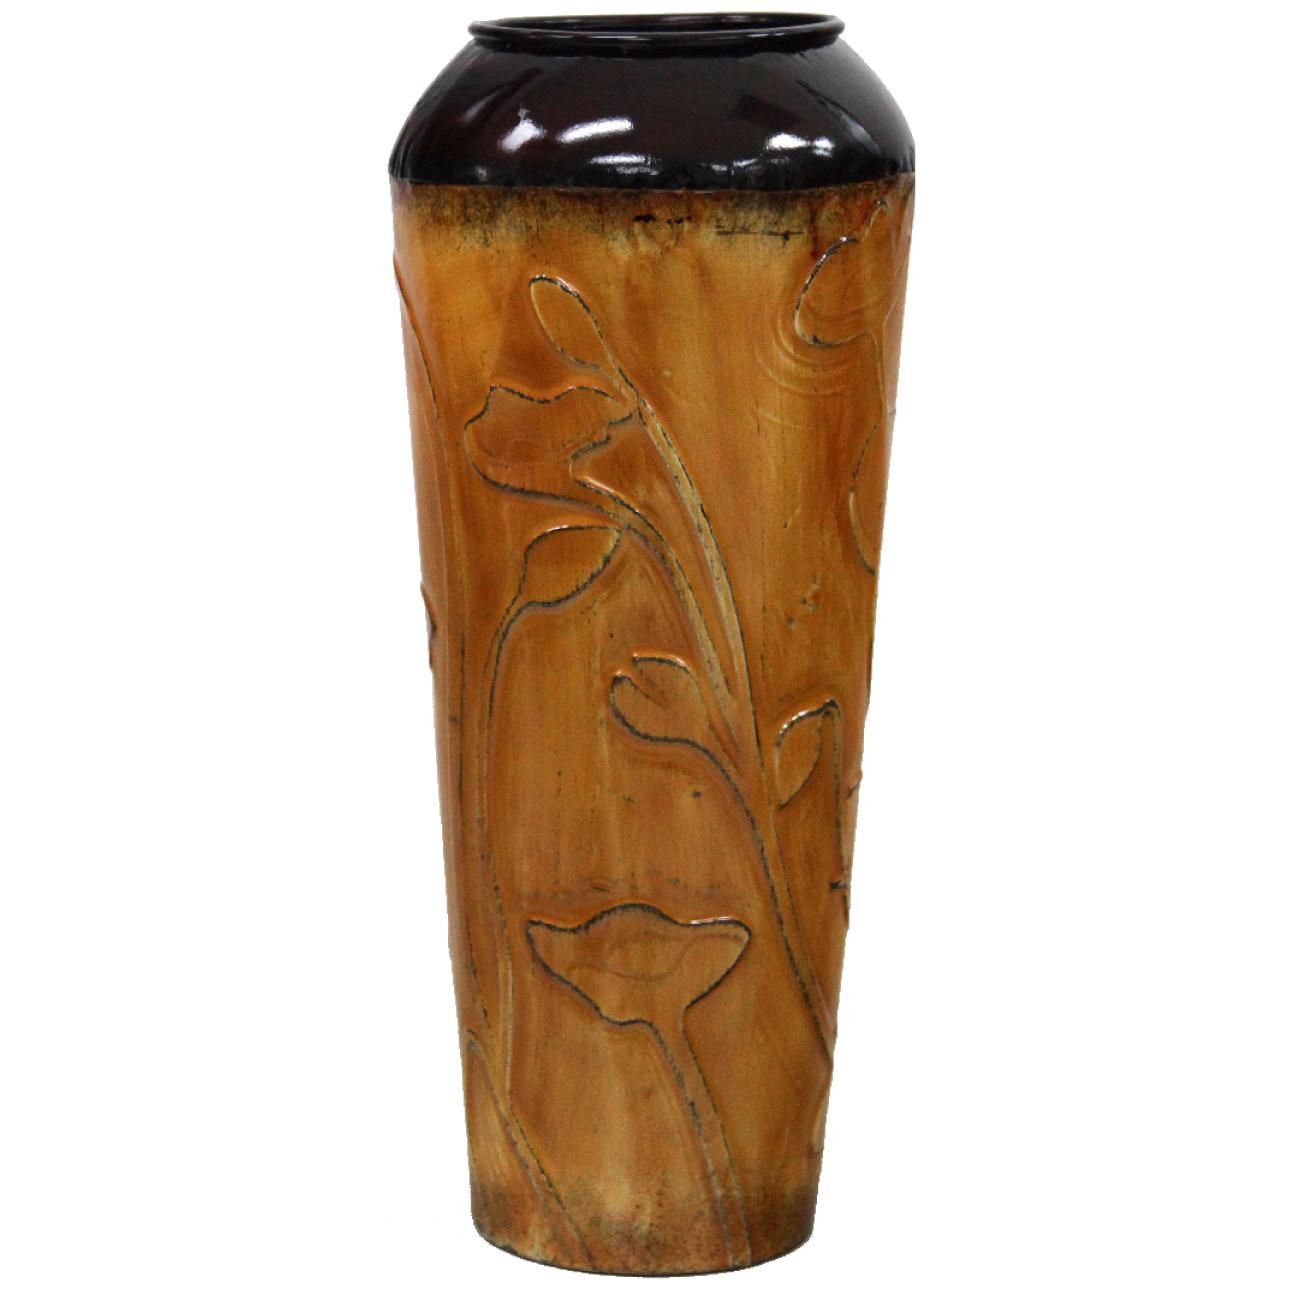 Home Source Table Top-Metal Cylinder Vase - Orange/Yellow